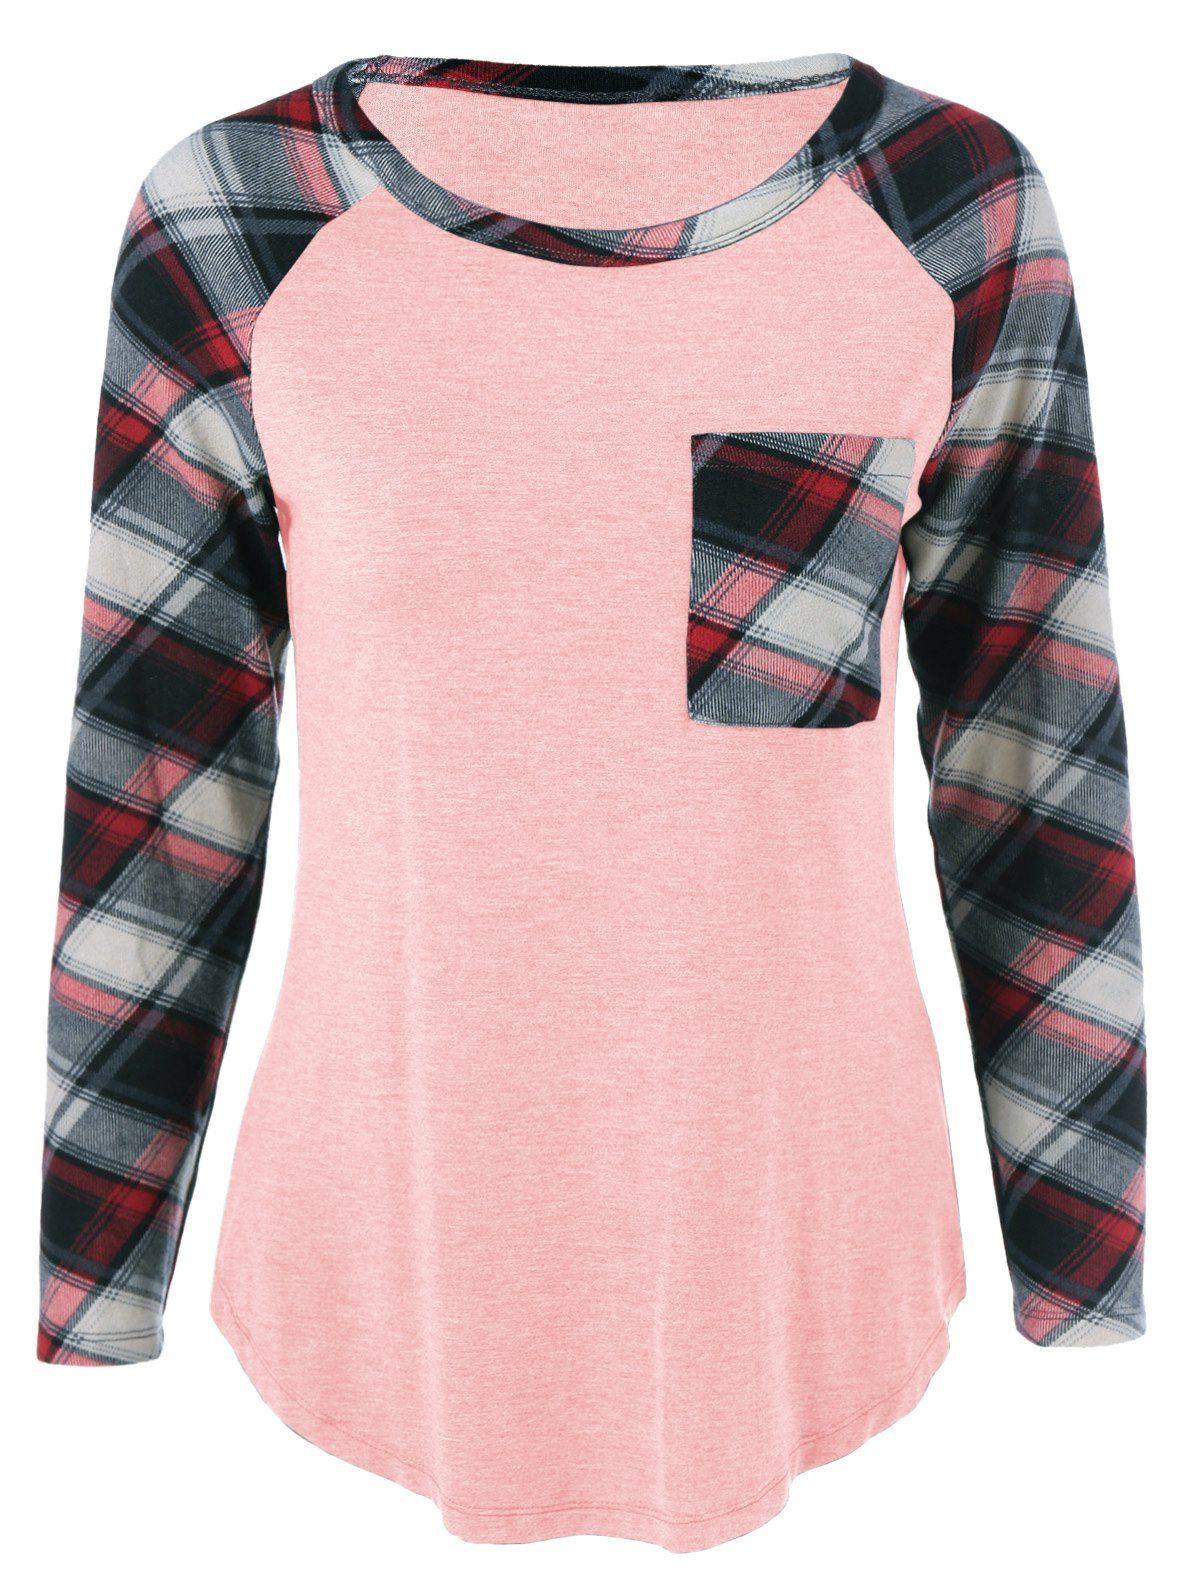 Plus size flannel shirt dress  Plus Size One Pocket Plaid Long Sleeve TShirt  Style  Pinterest